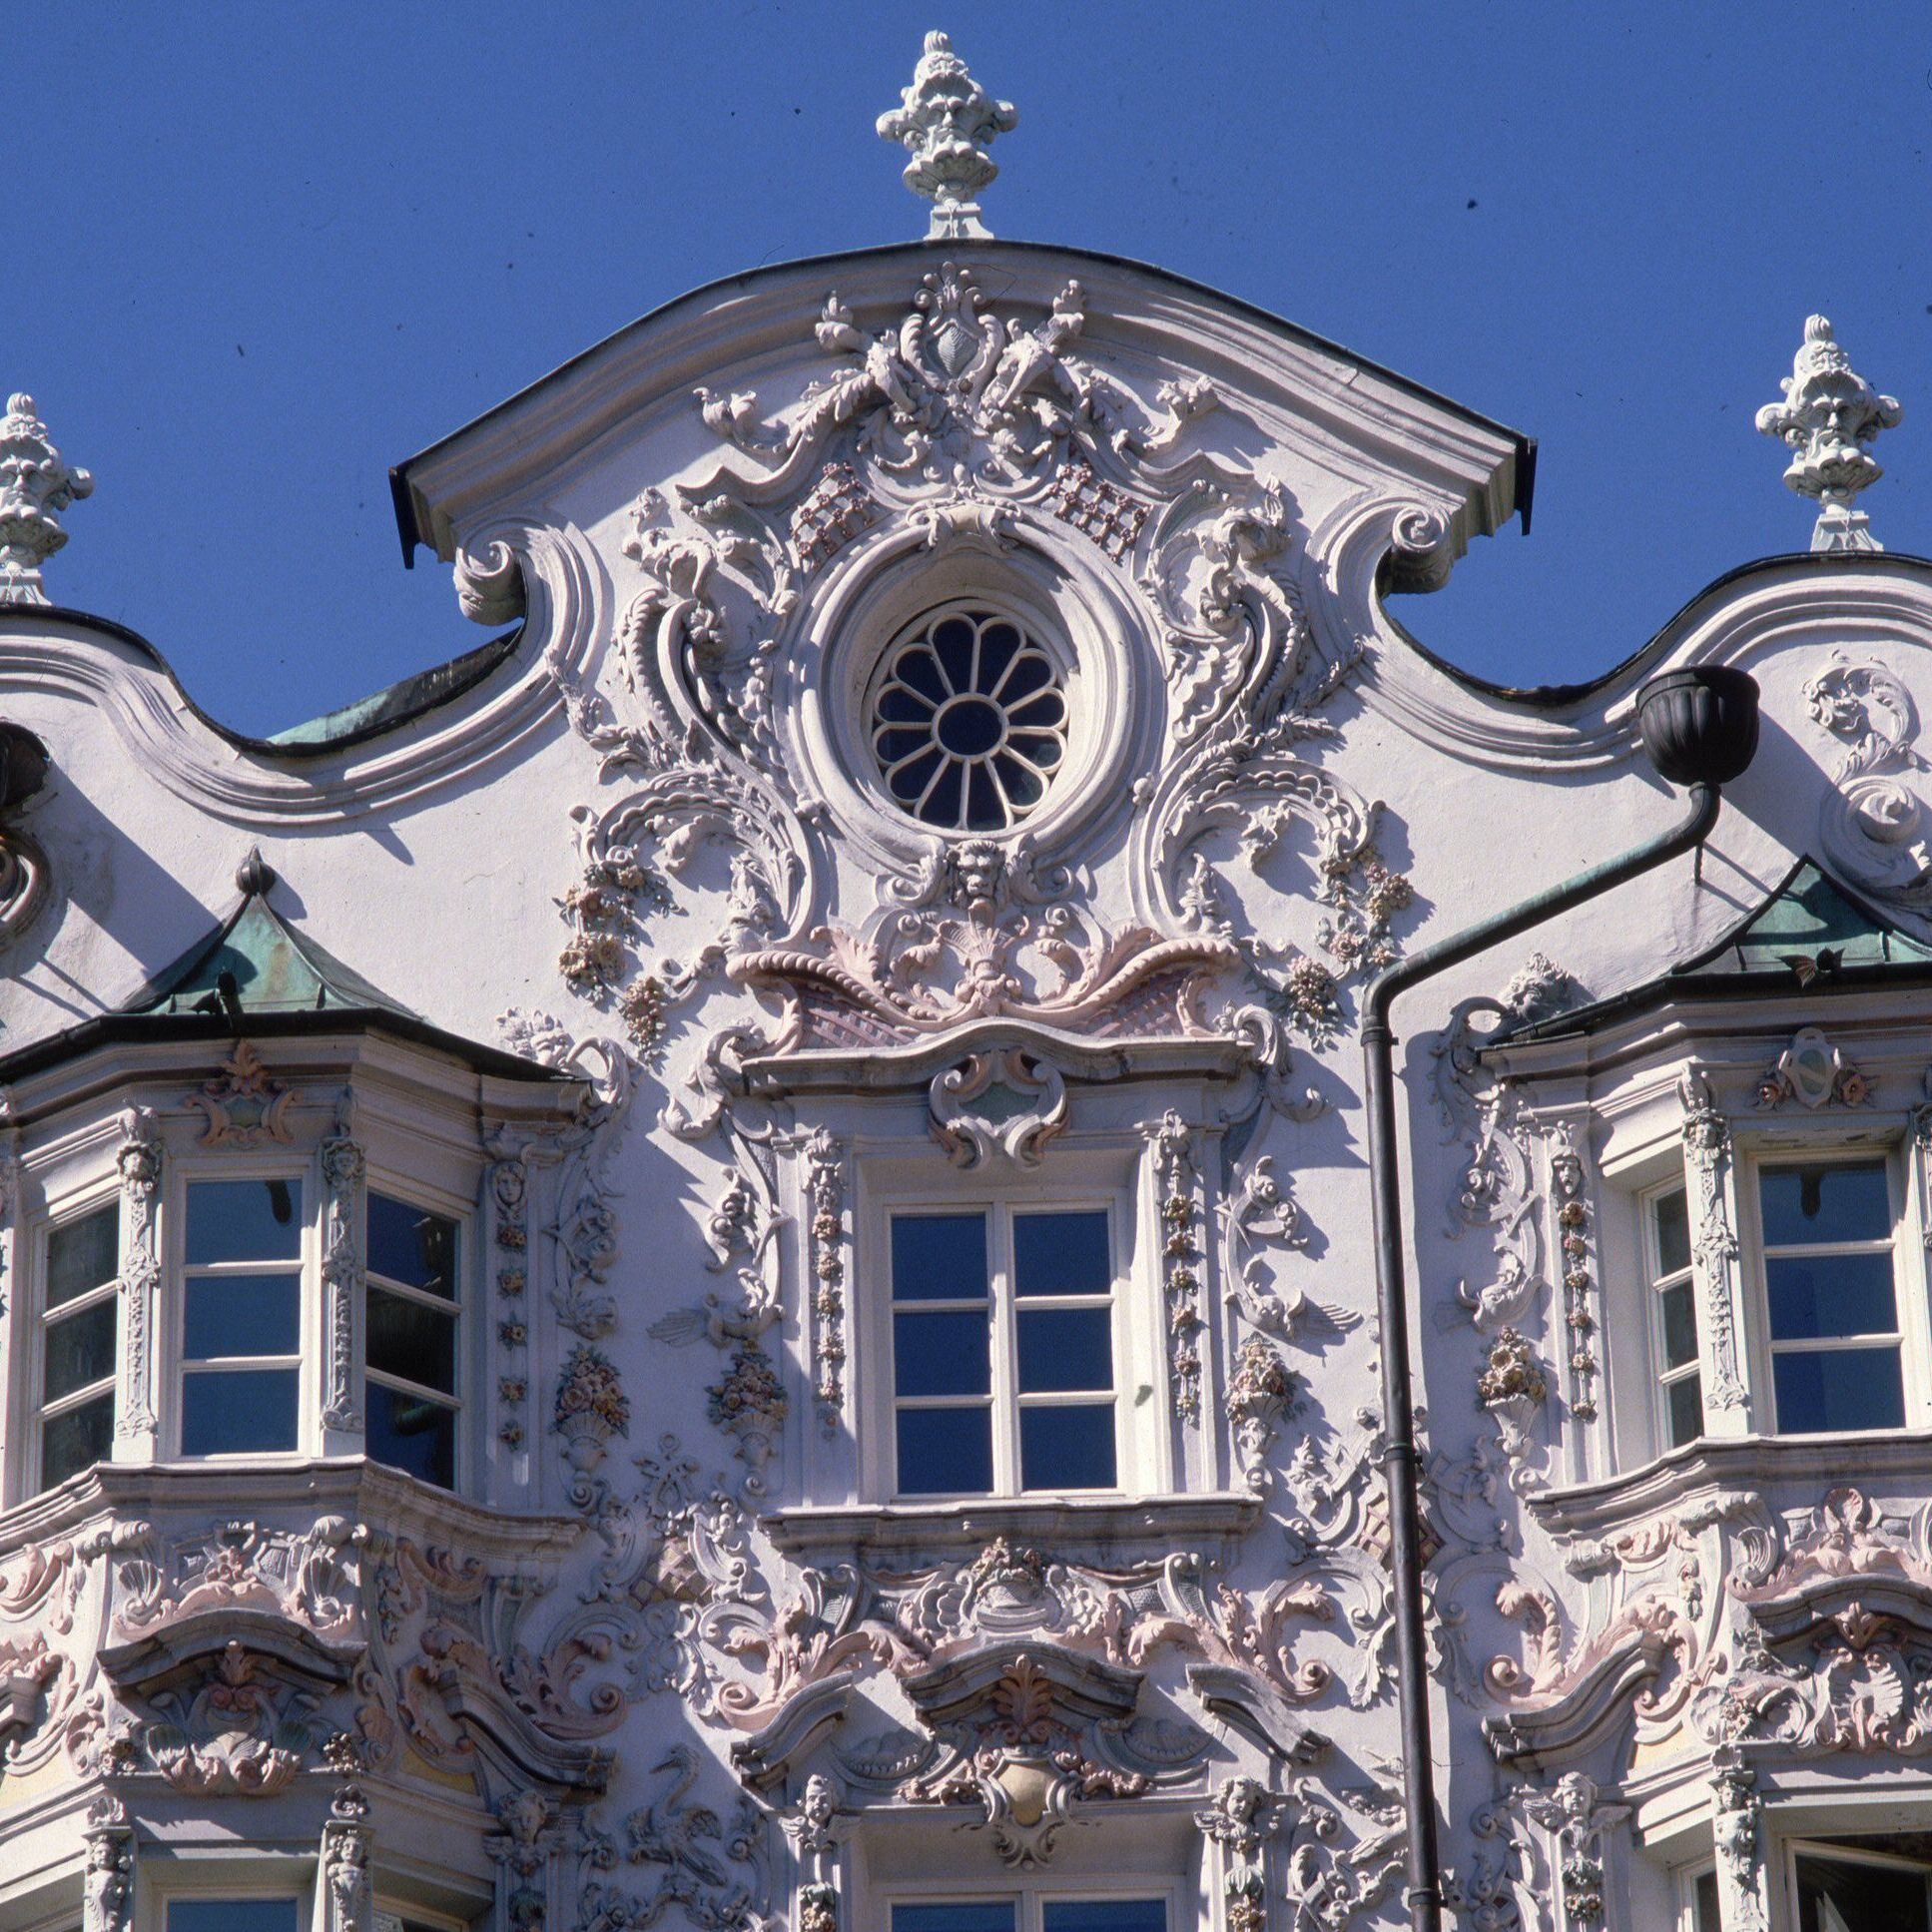 What Makes Baroque Unique To Rococo